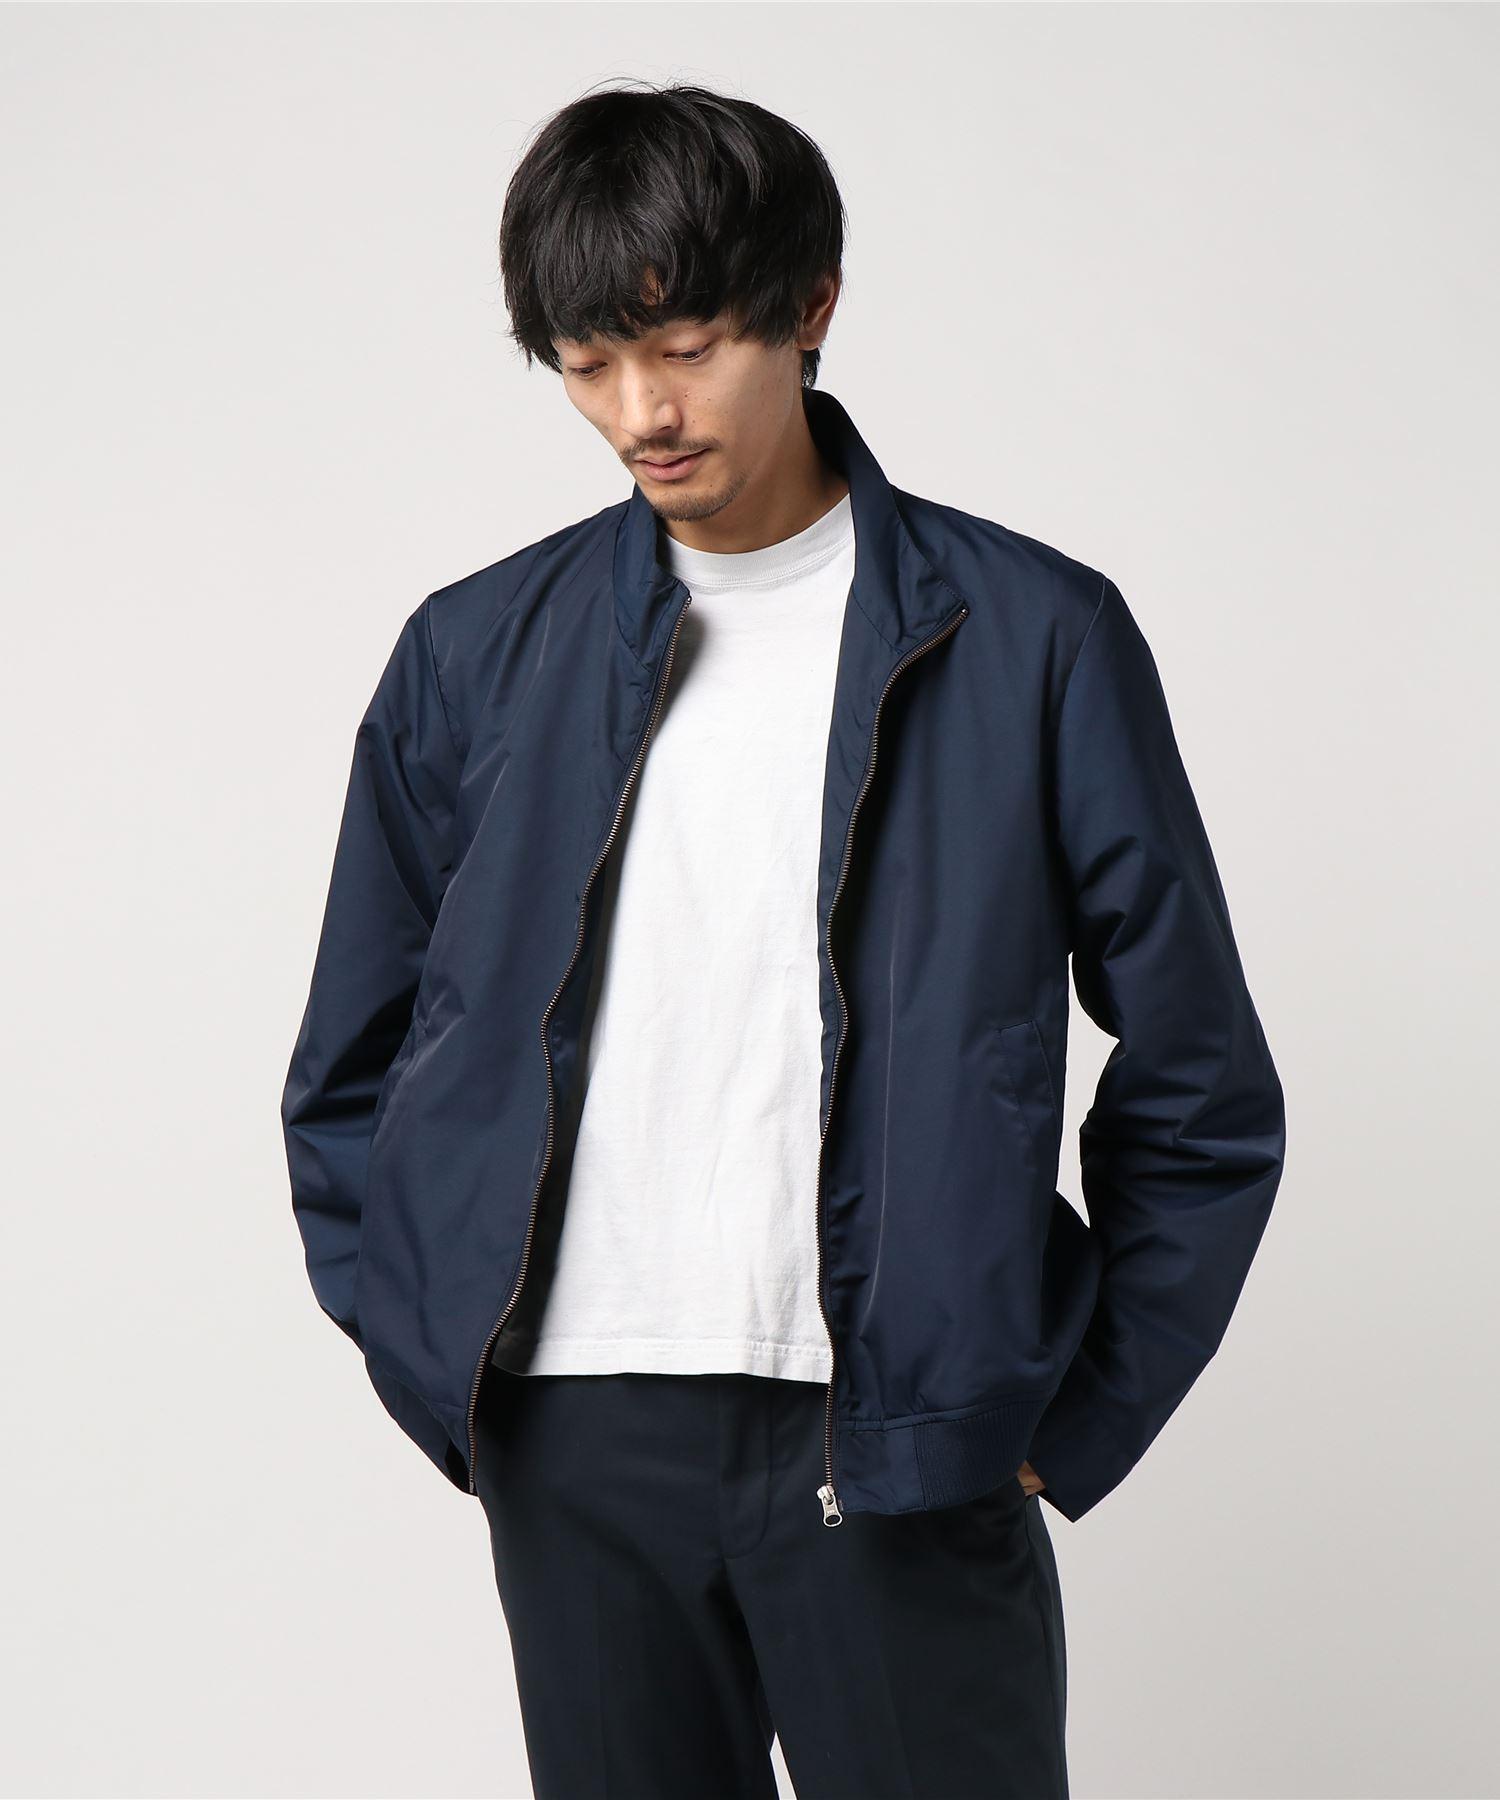 AR321 Stand Collar Jacket/AR321 スタンドカラージャケット